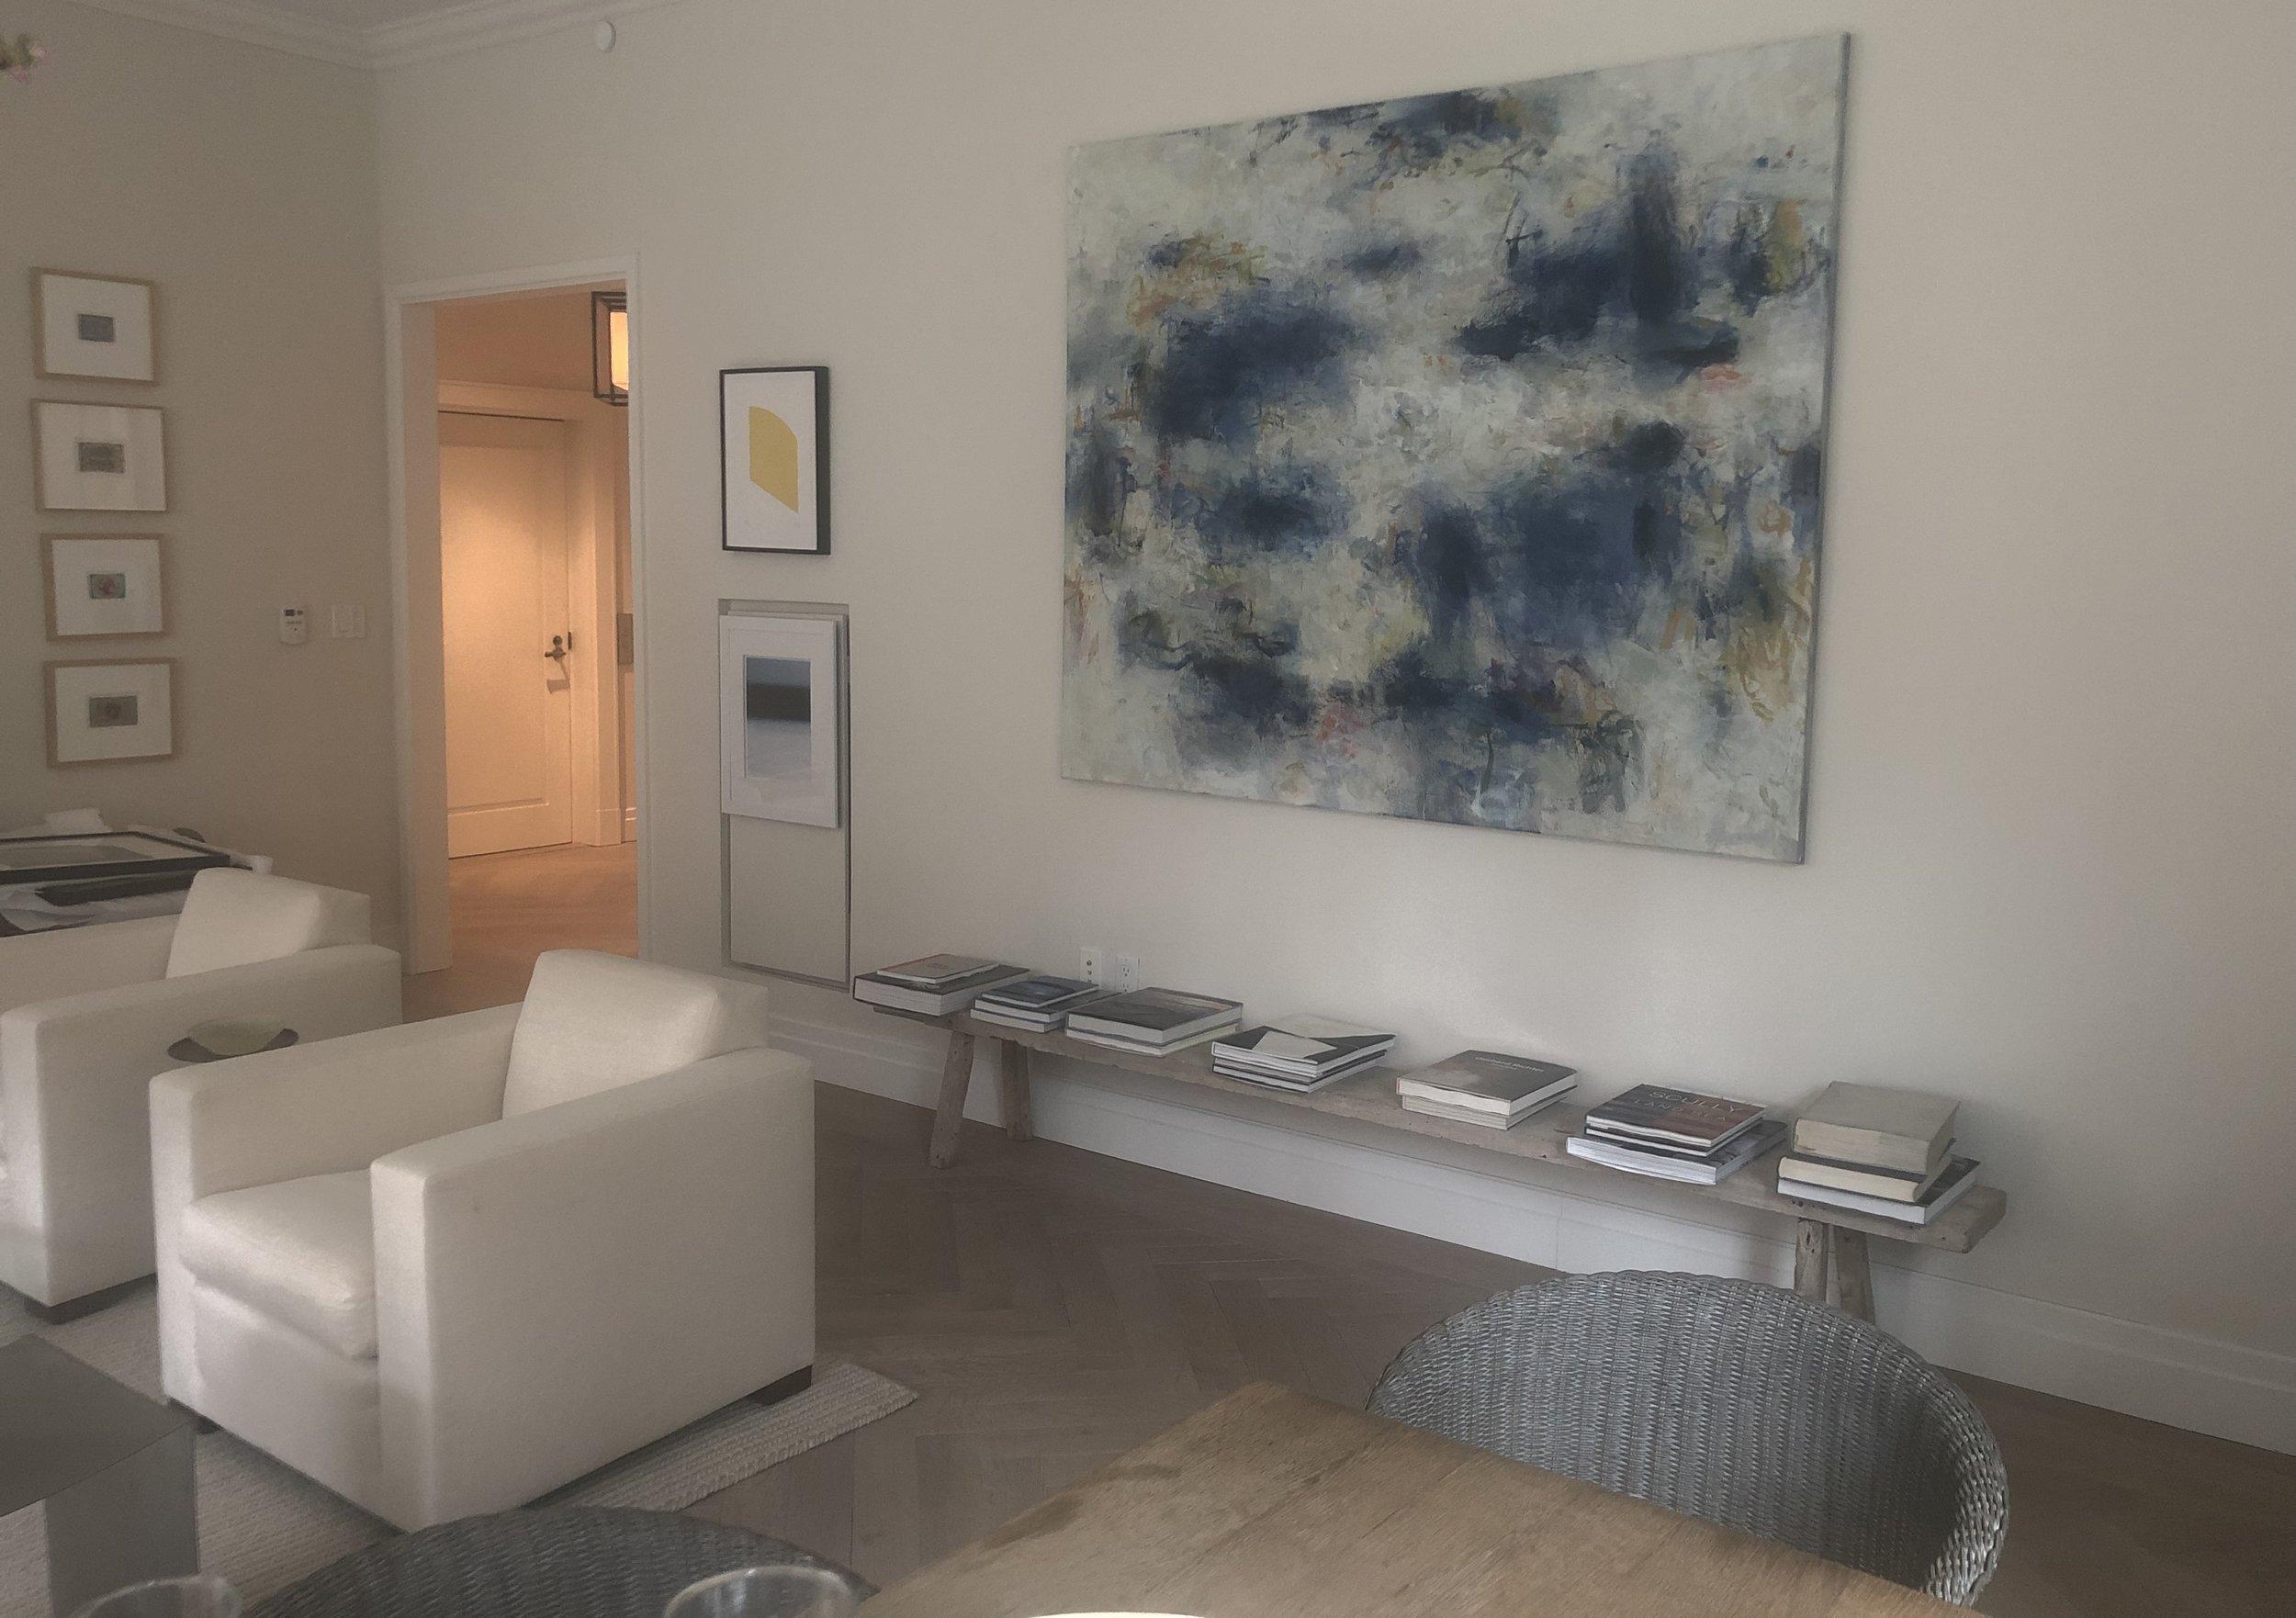 Raymond's work in situ